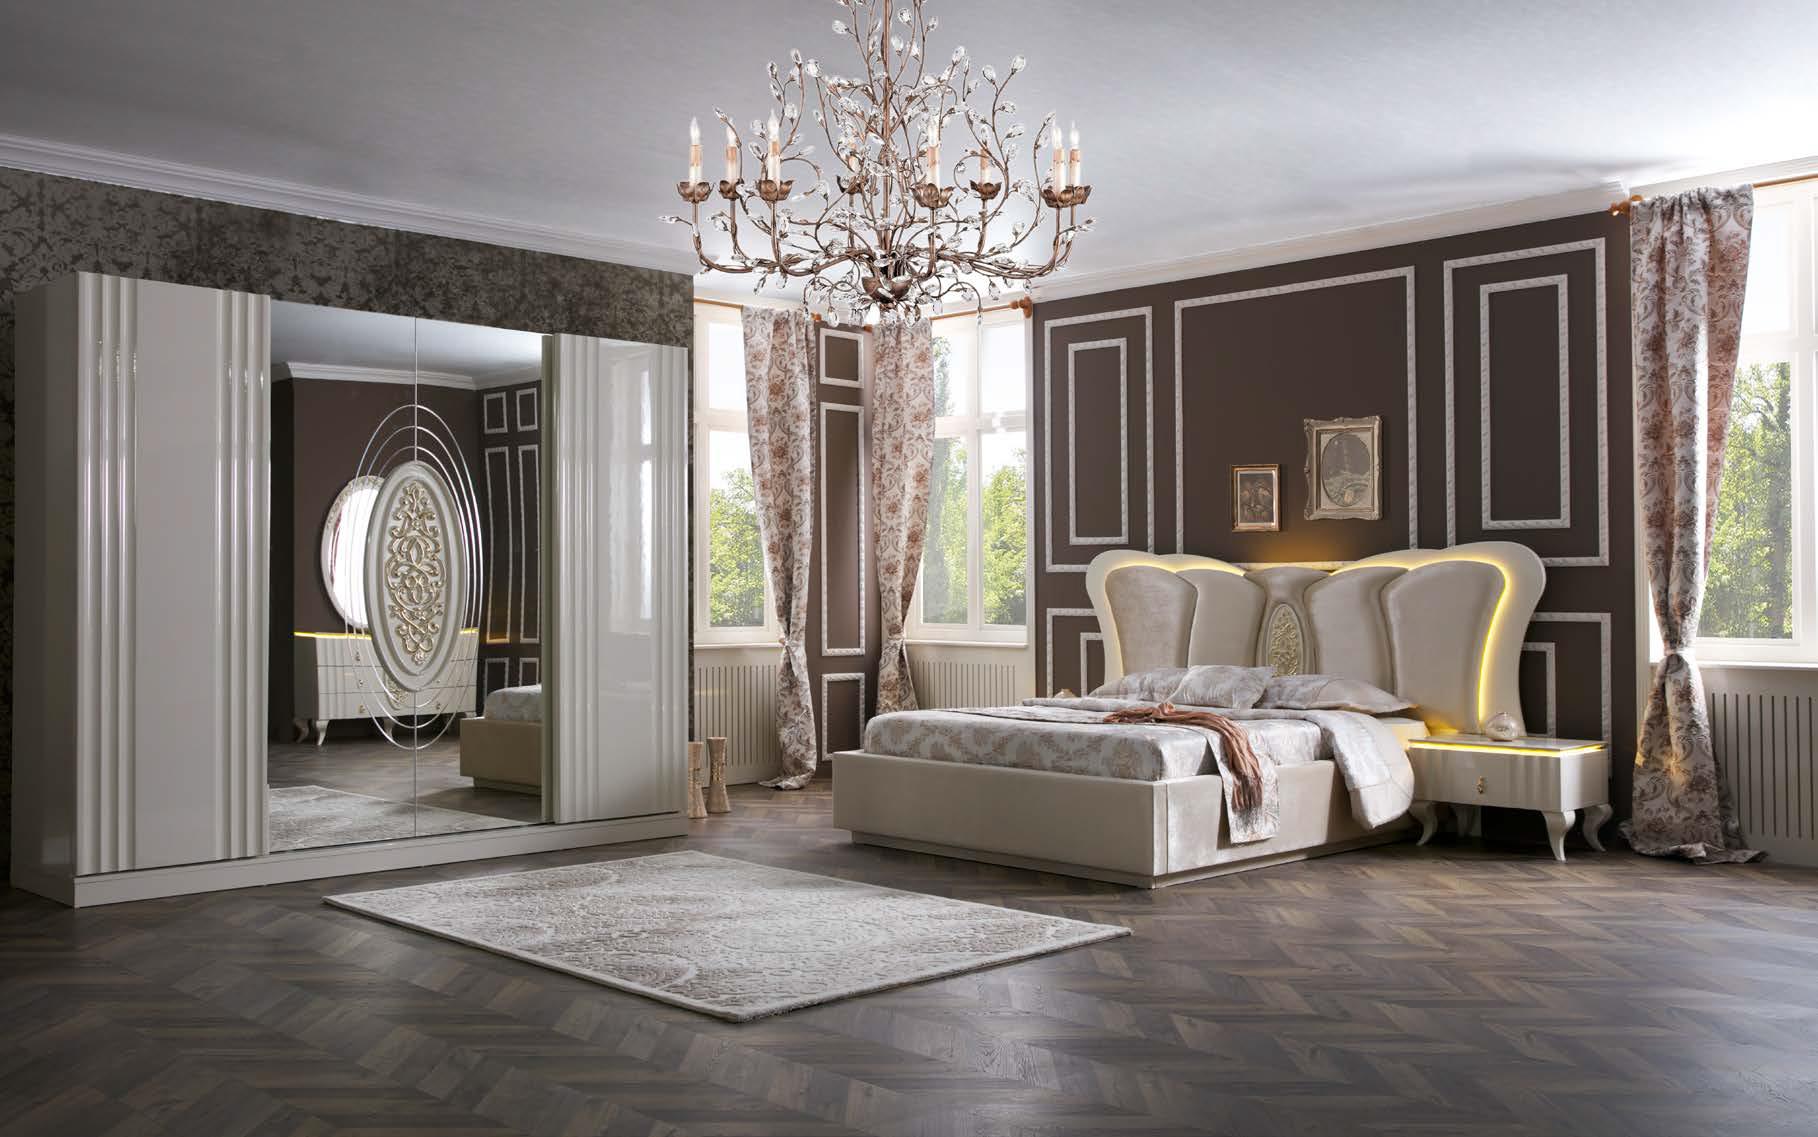 santos schlafzimmer yuvam m belhaus in wuppertal cilek. Black Bedroom Furniture Sets. Home Design Ideas